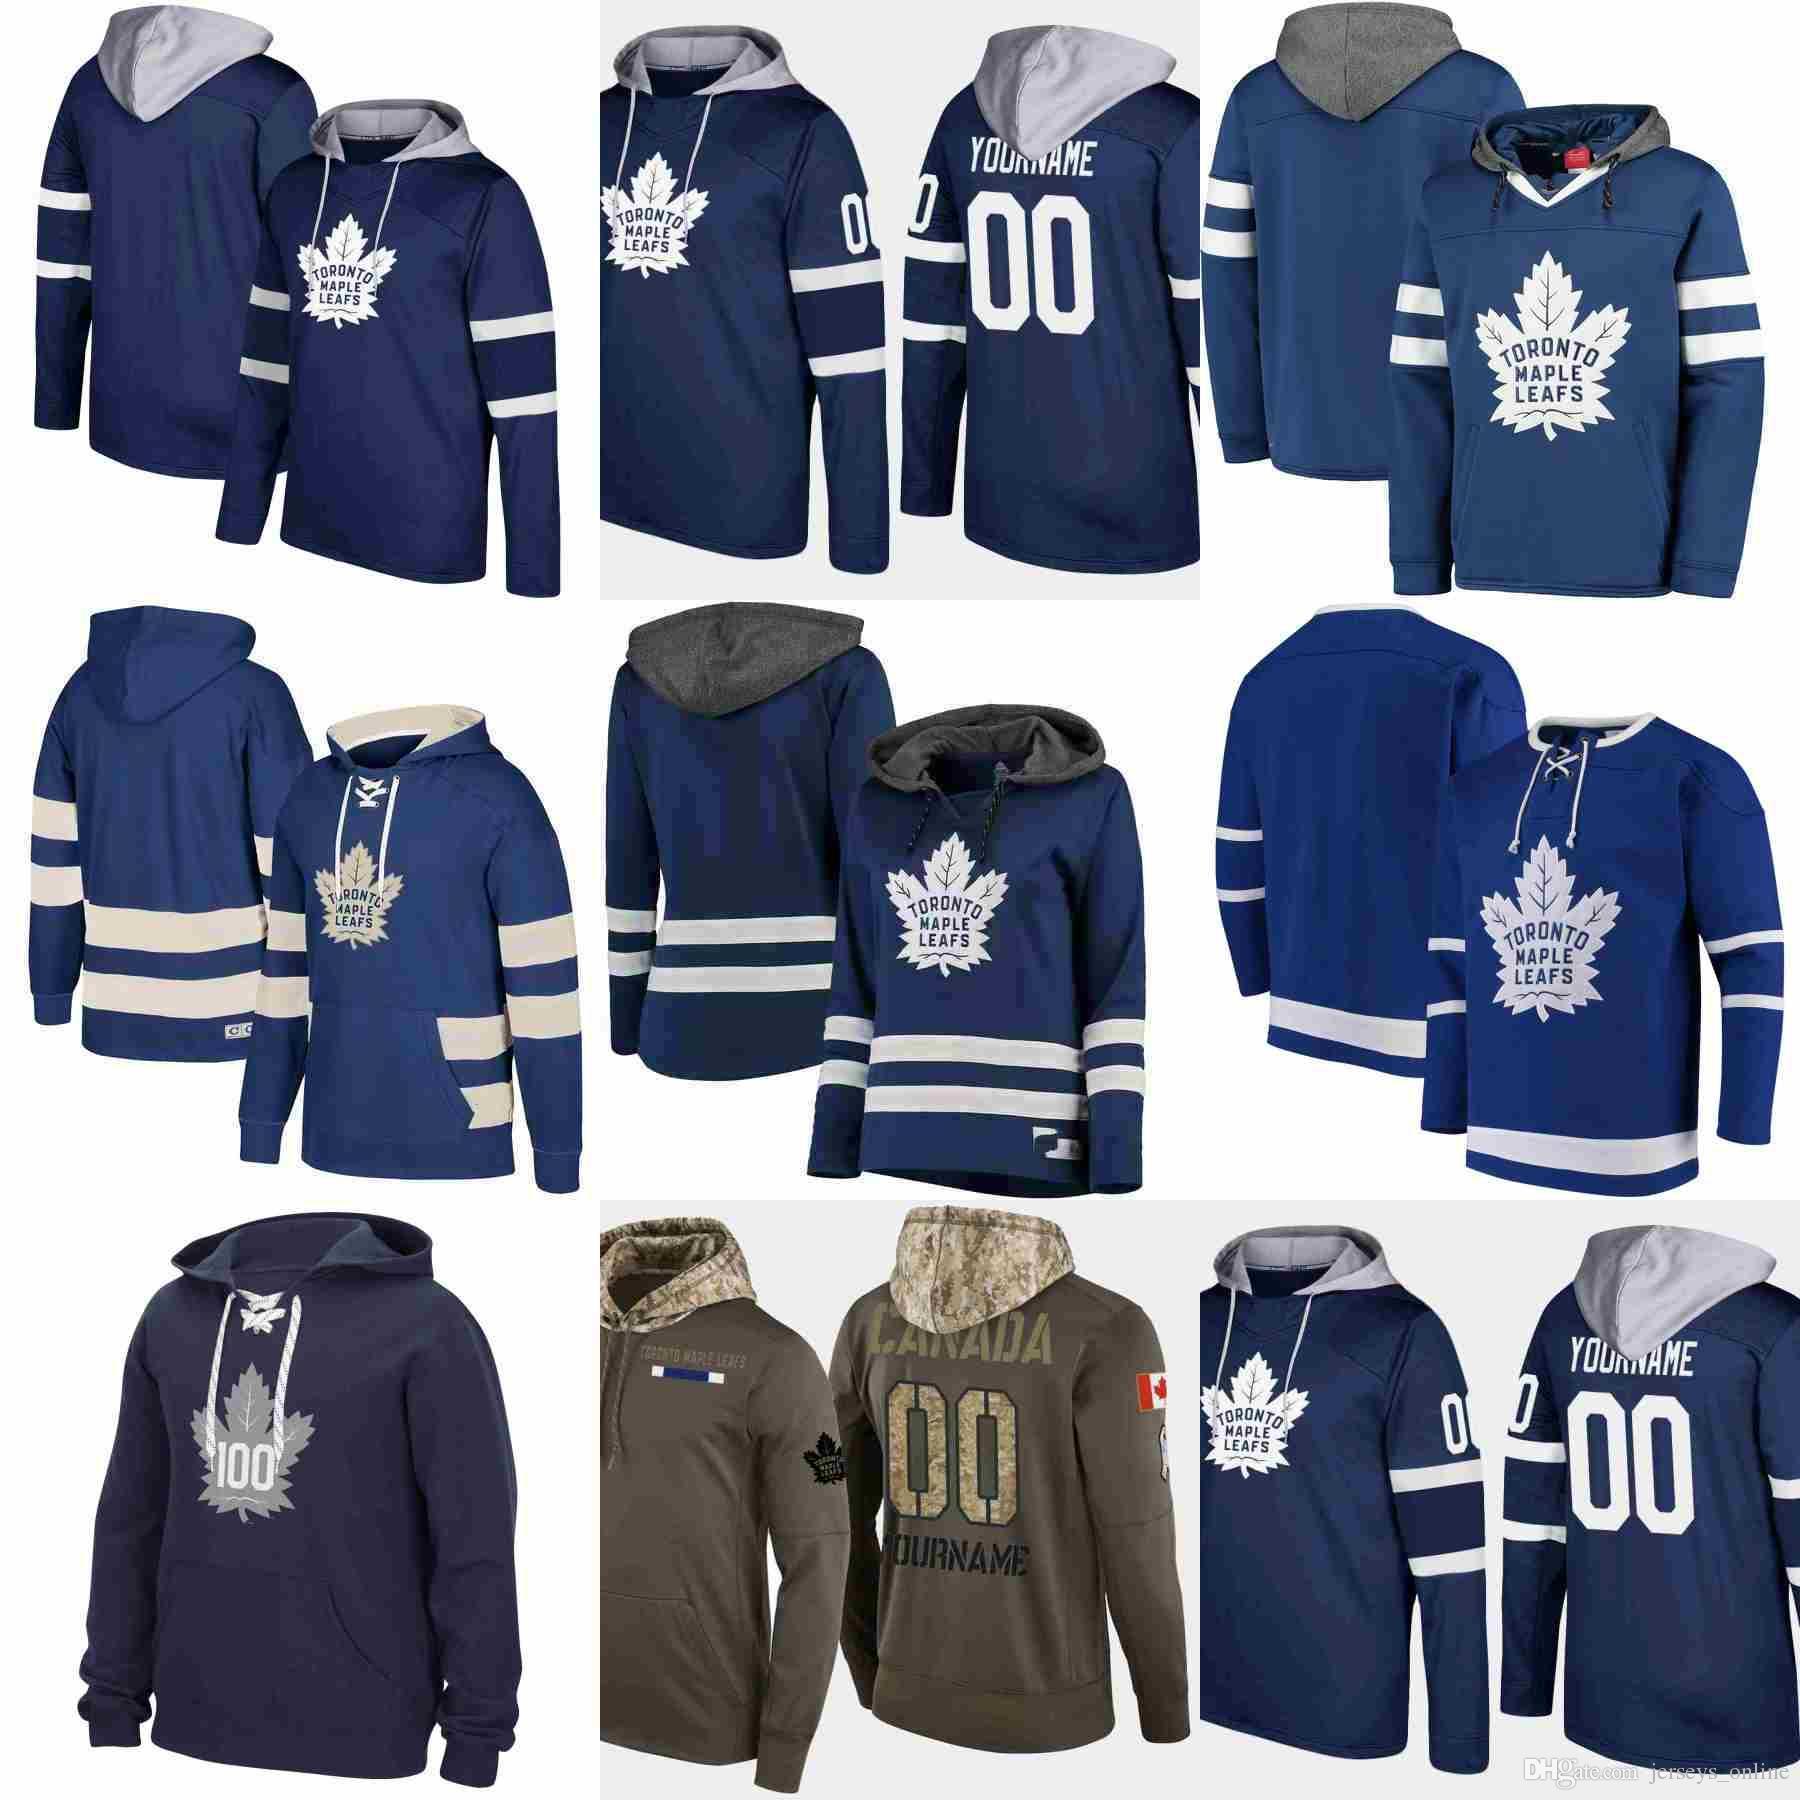 size 40 33723 4be54 Toronto Maple Leafs hoodie John Tavares A patch AustonMatthews Mitchell  Marner william nylander Hockey Jersey Sweatshirt stitched